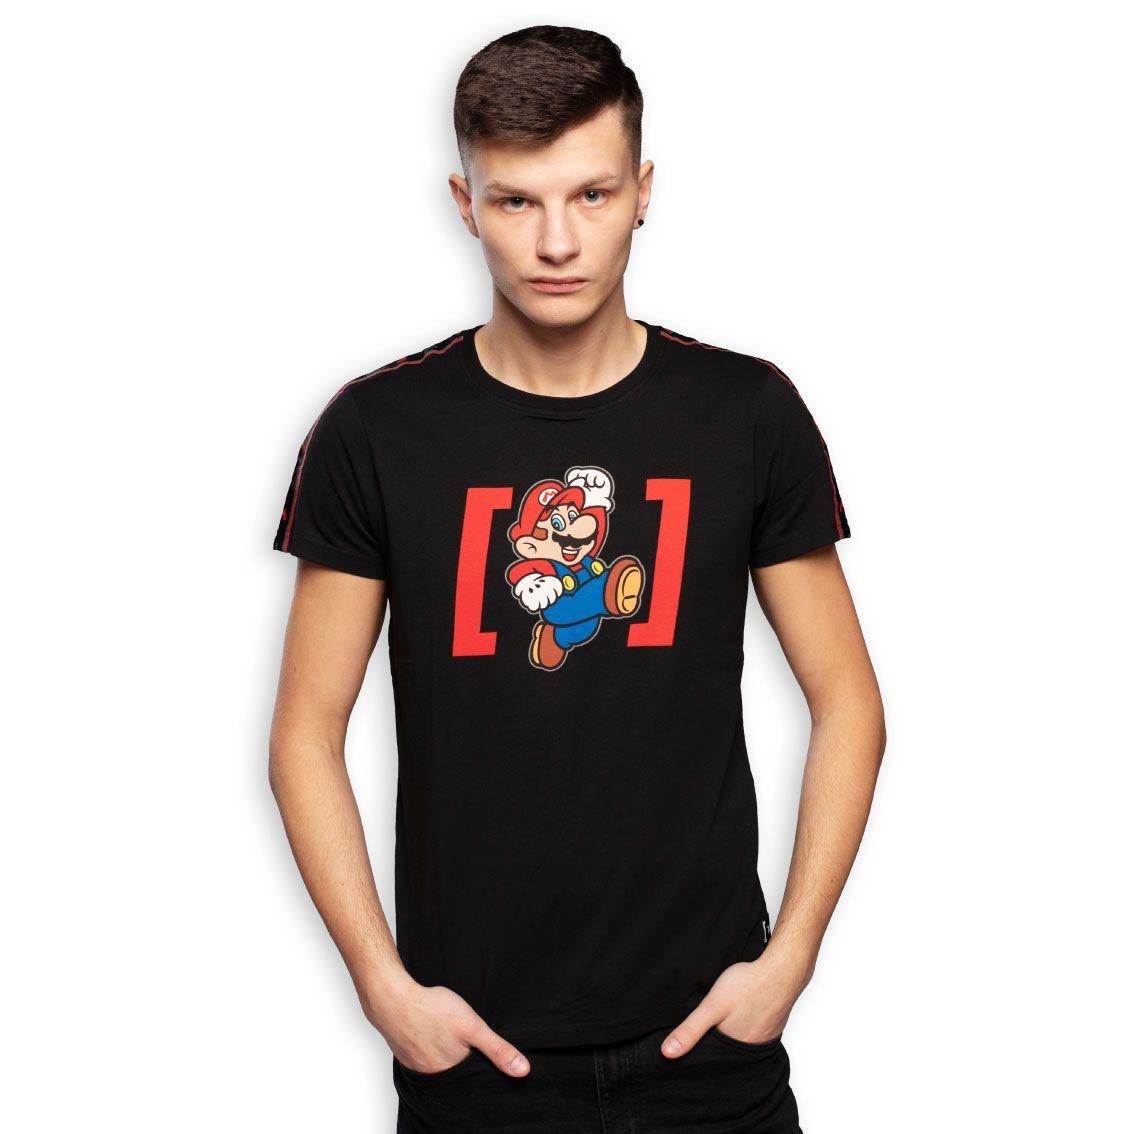 T-shirt homme super mario